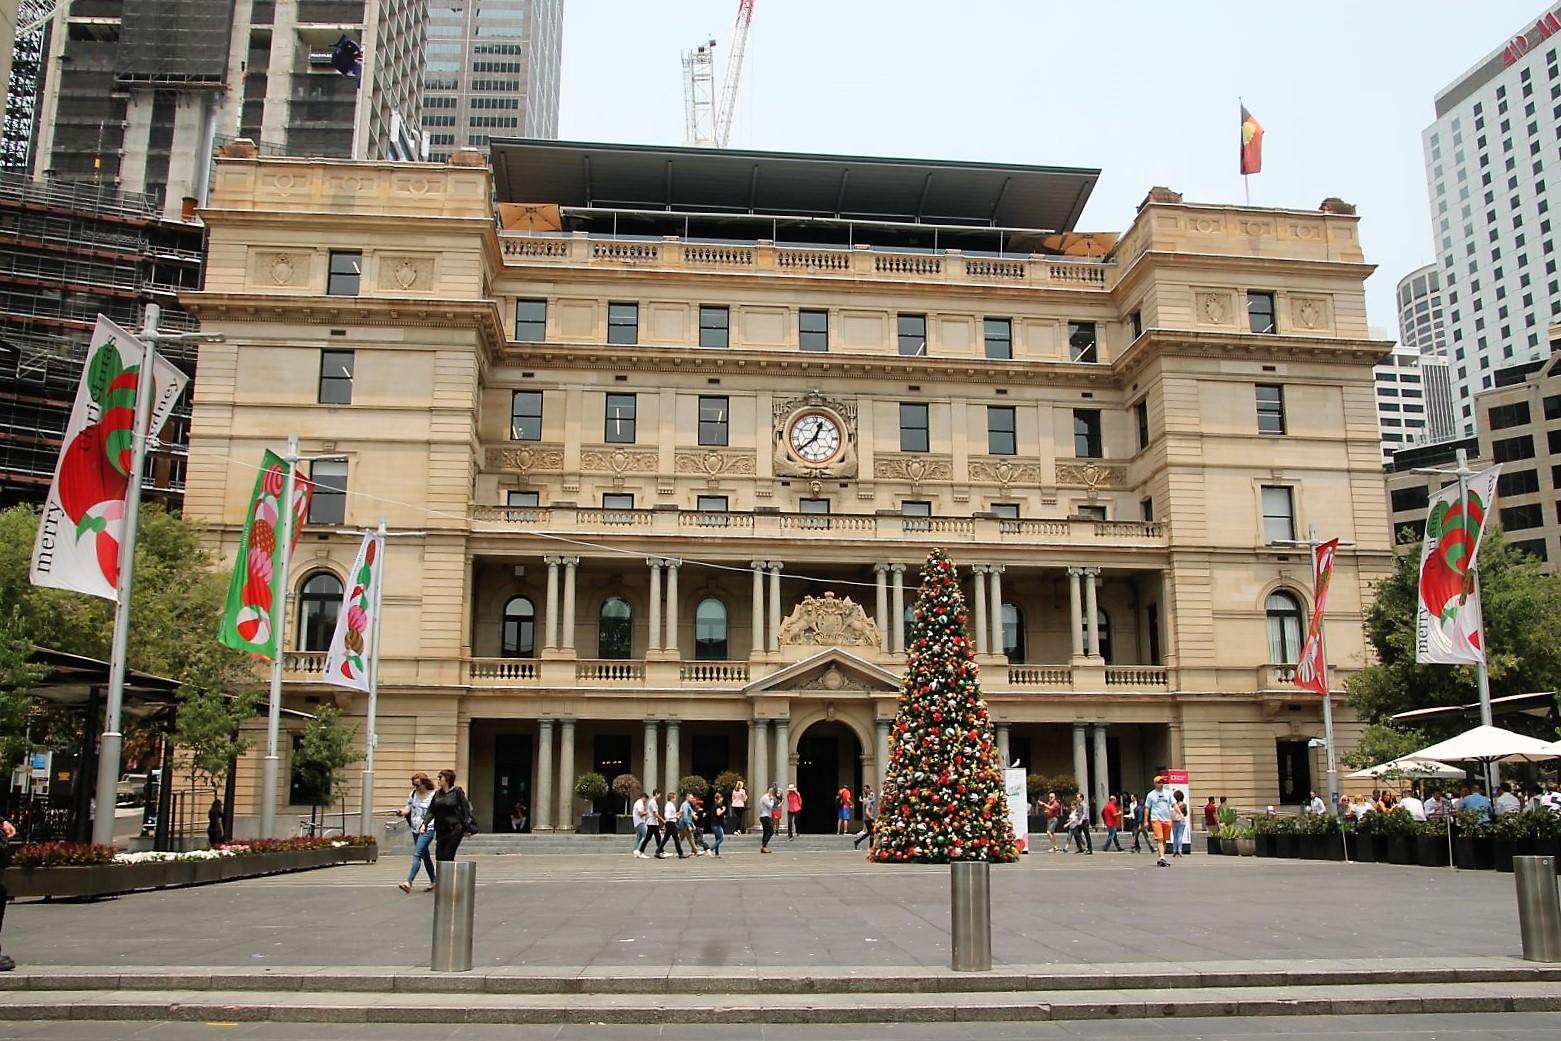 City-Sydney-7-1